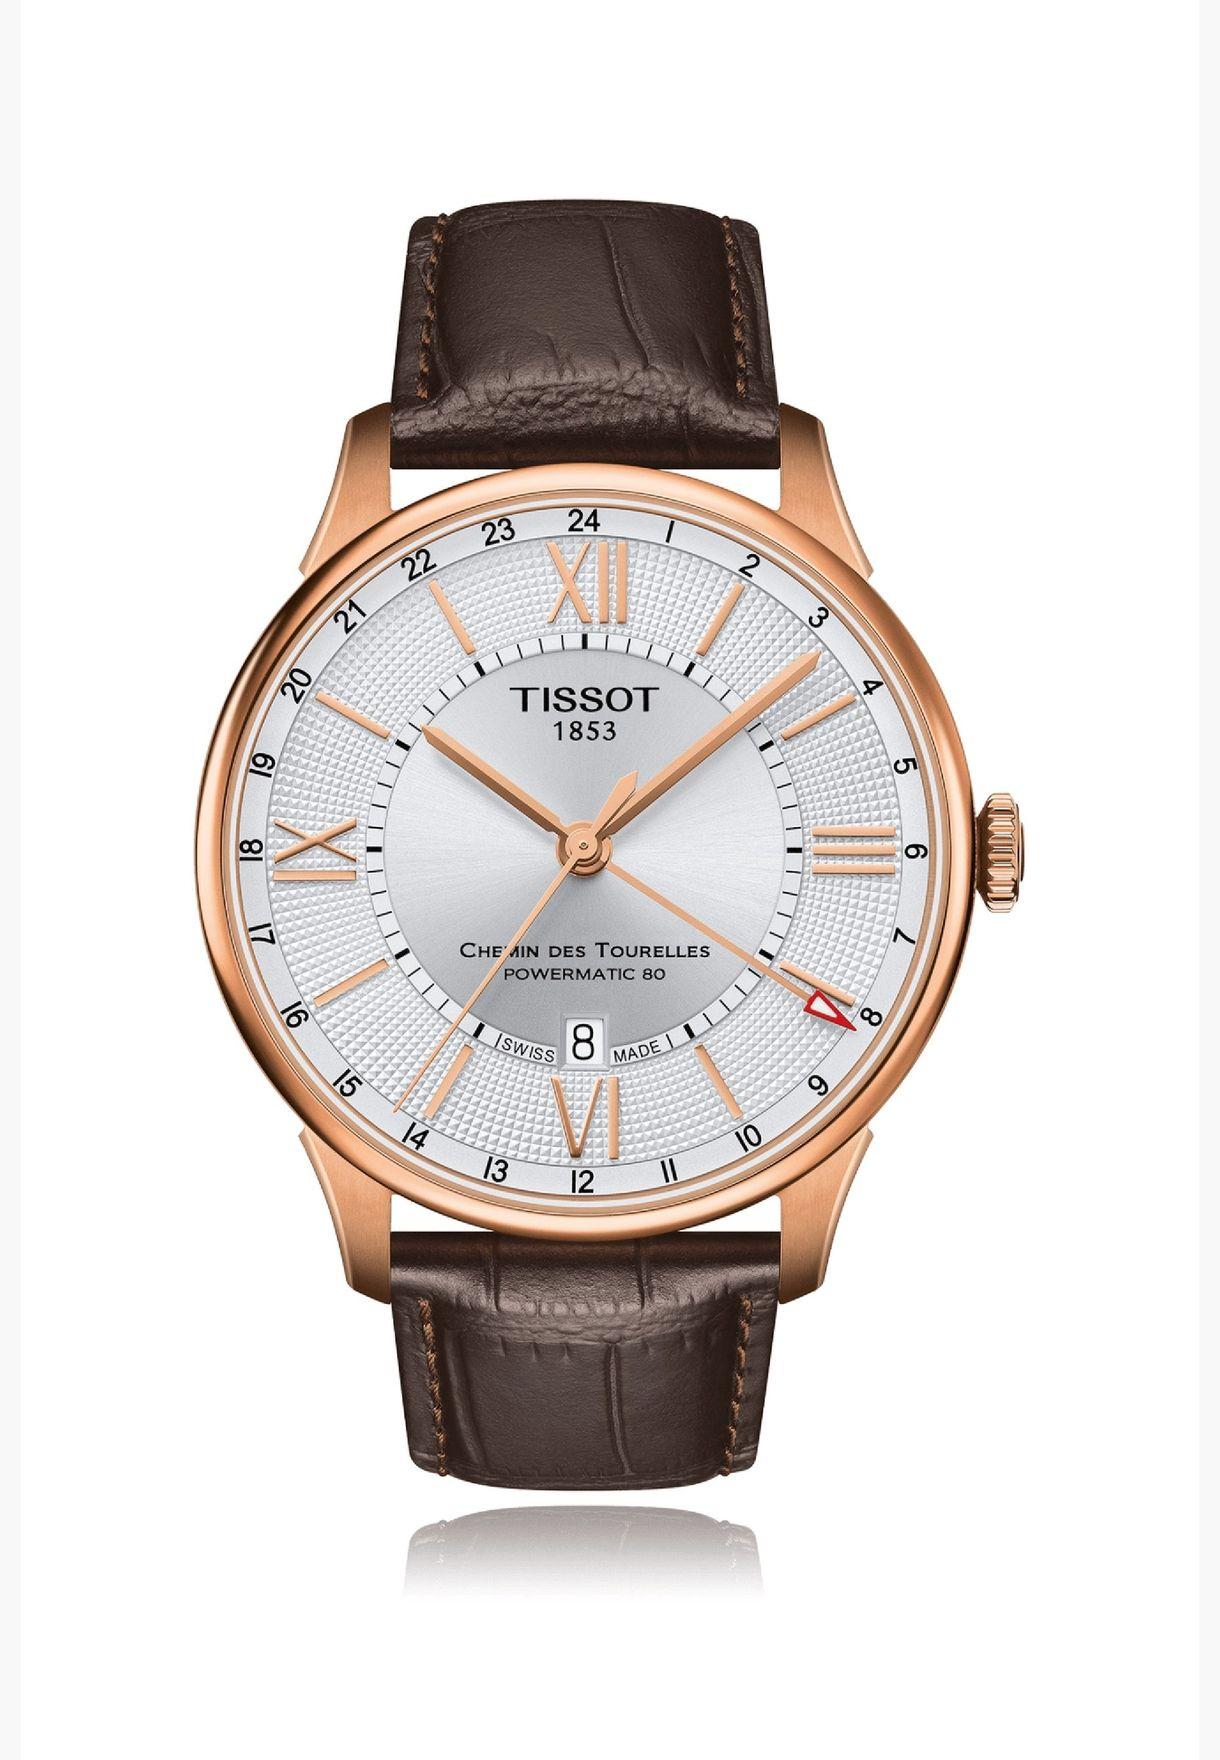 ساعة تيسو شيمين دي توريل بسوار جلدي - T099.429.36.038.00